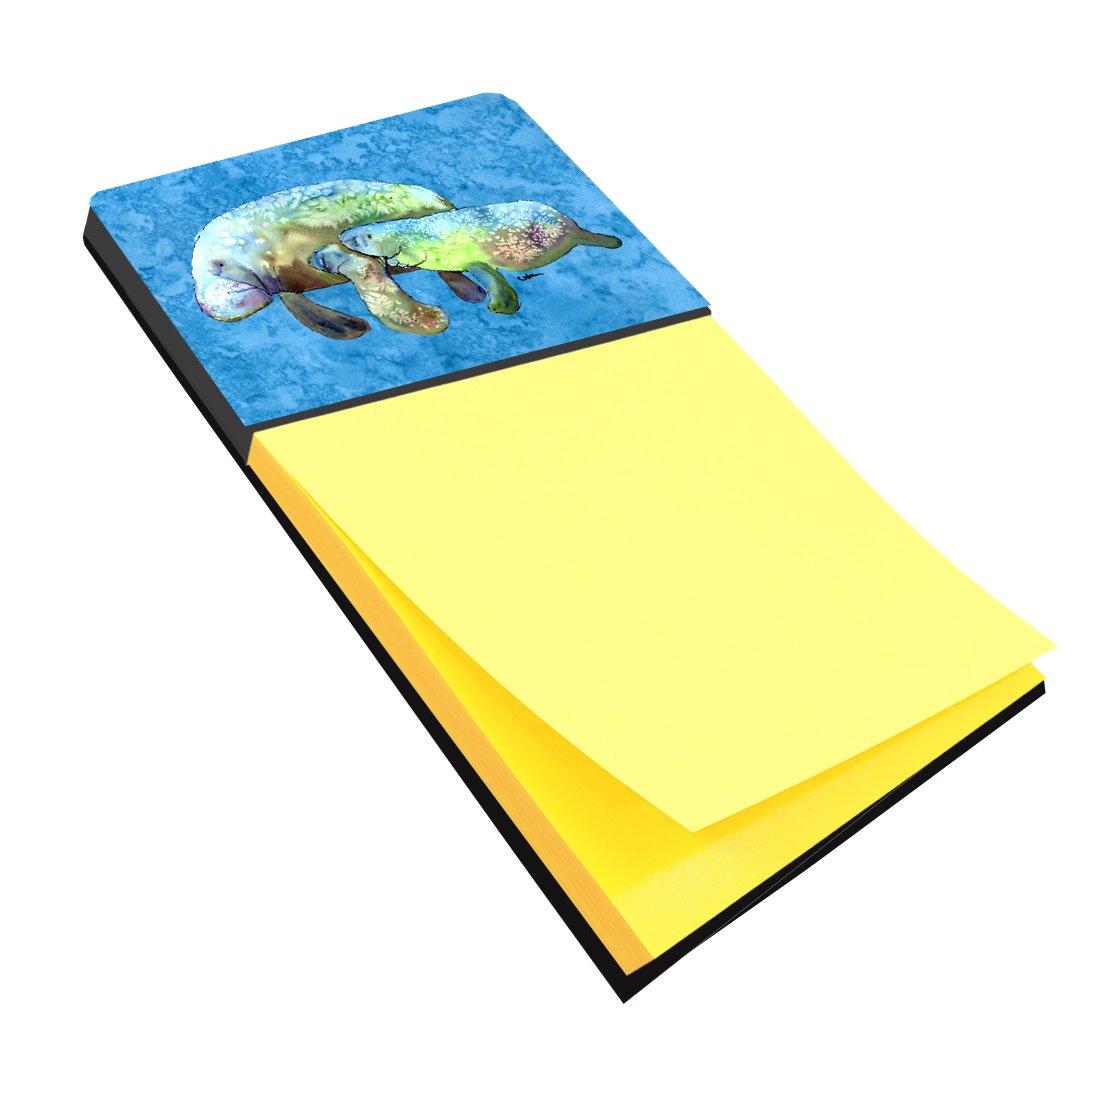 Caroline's Treasures 8660SN Manatee Refiillable Sticky Note Holder or Postit Note Dispenser, Large, Multicolor